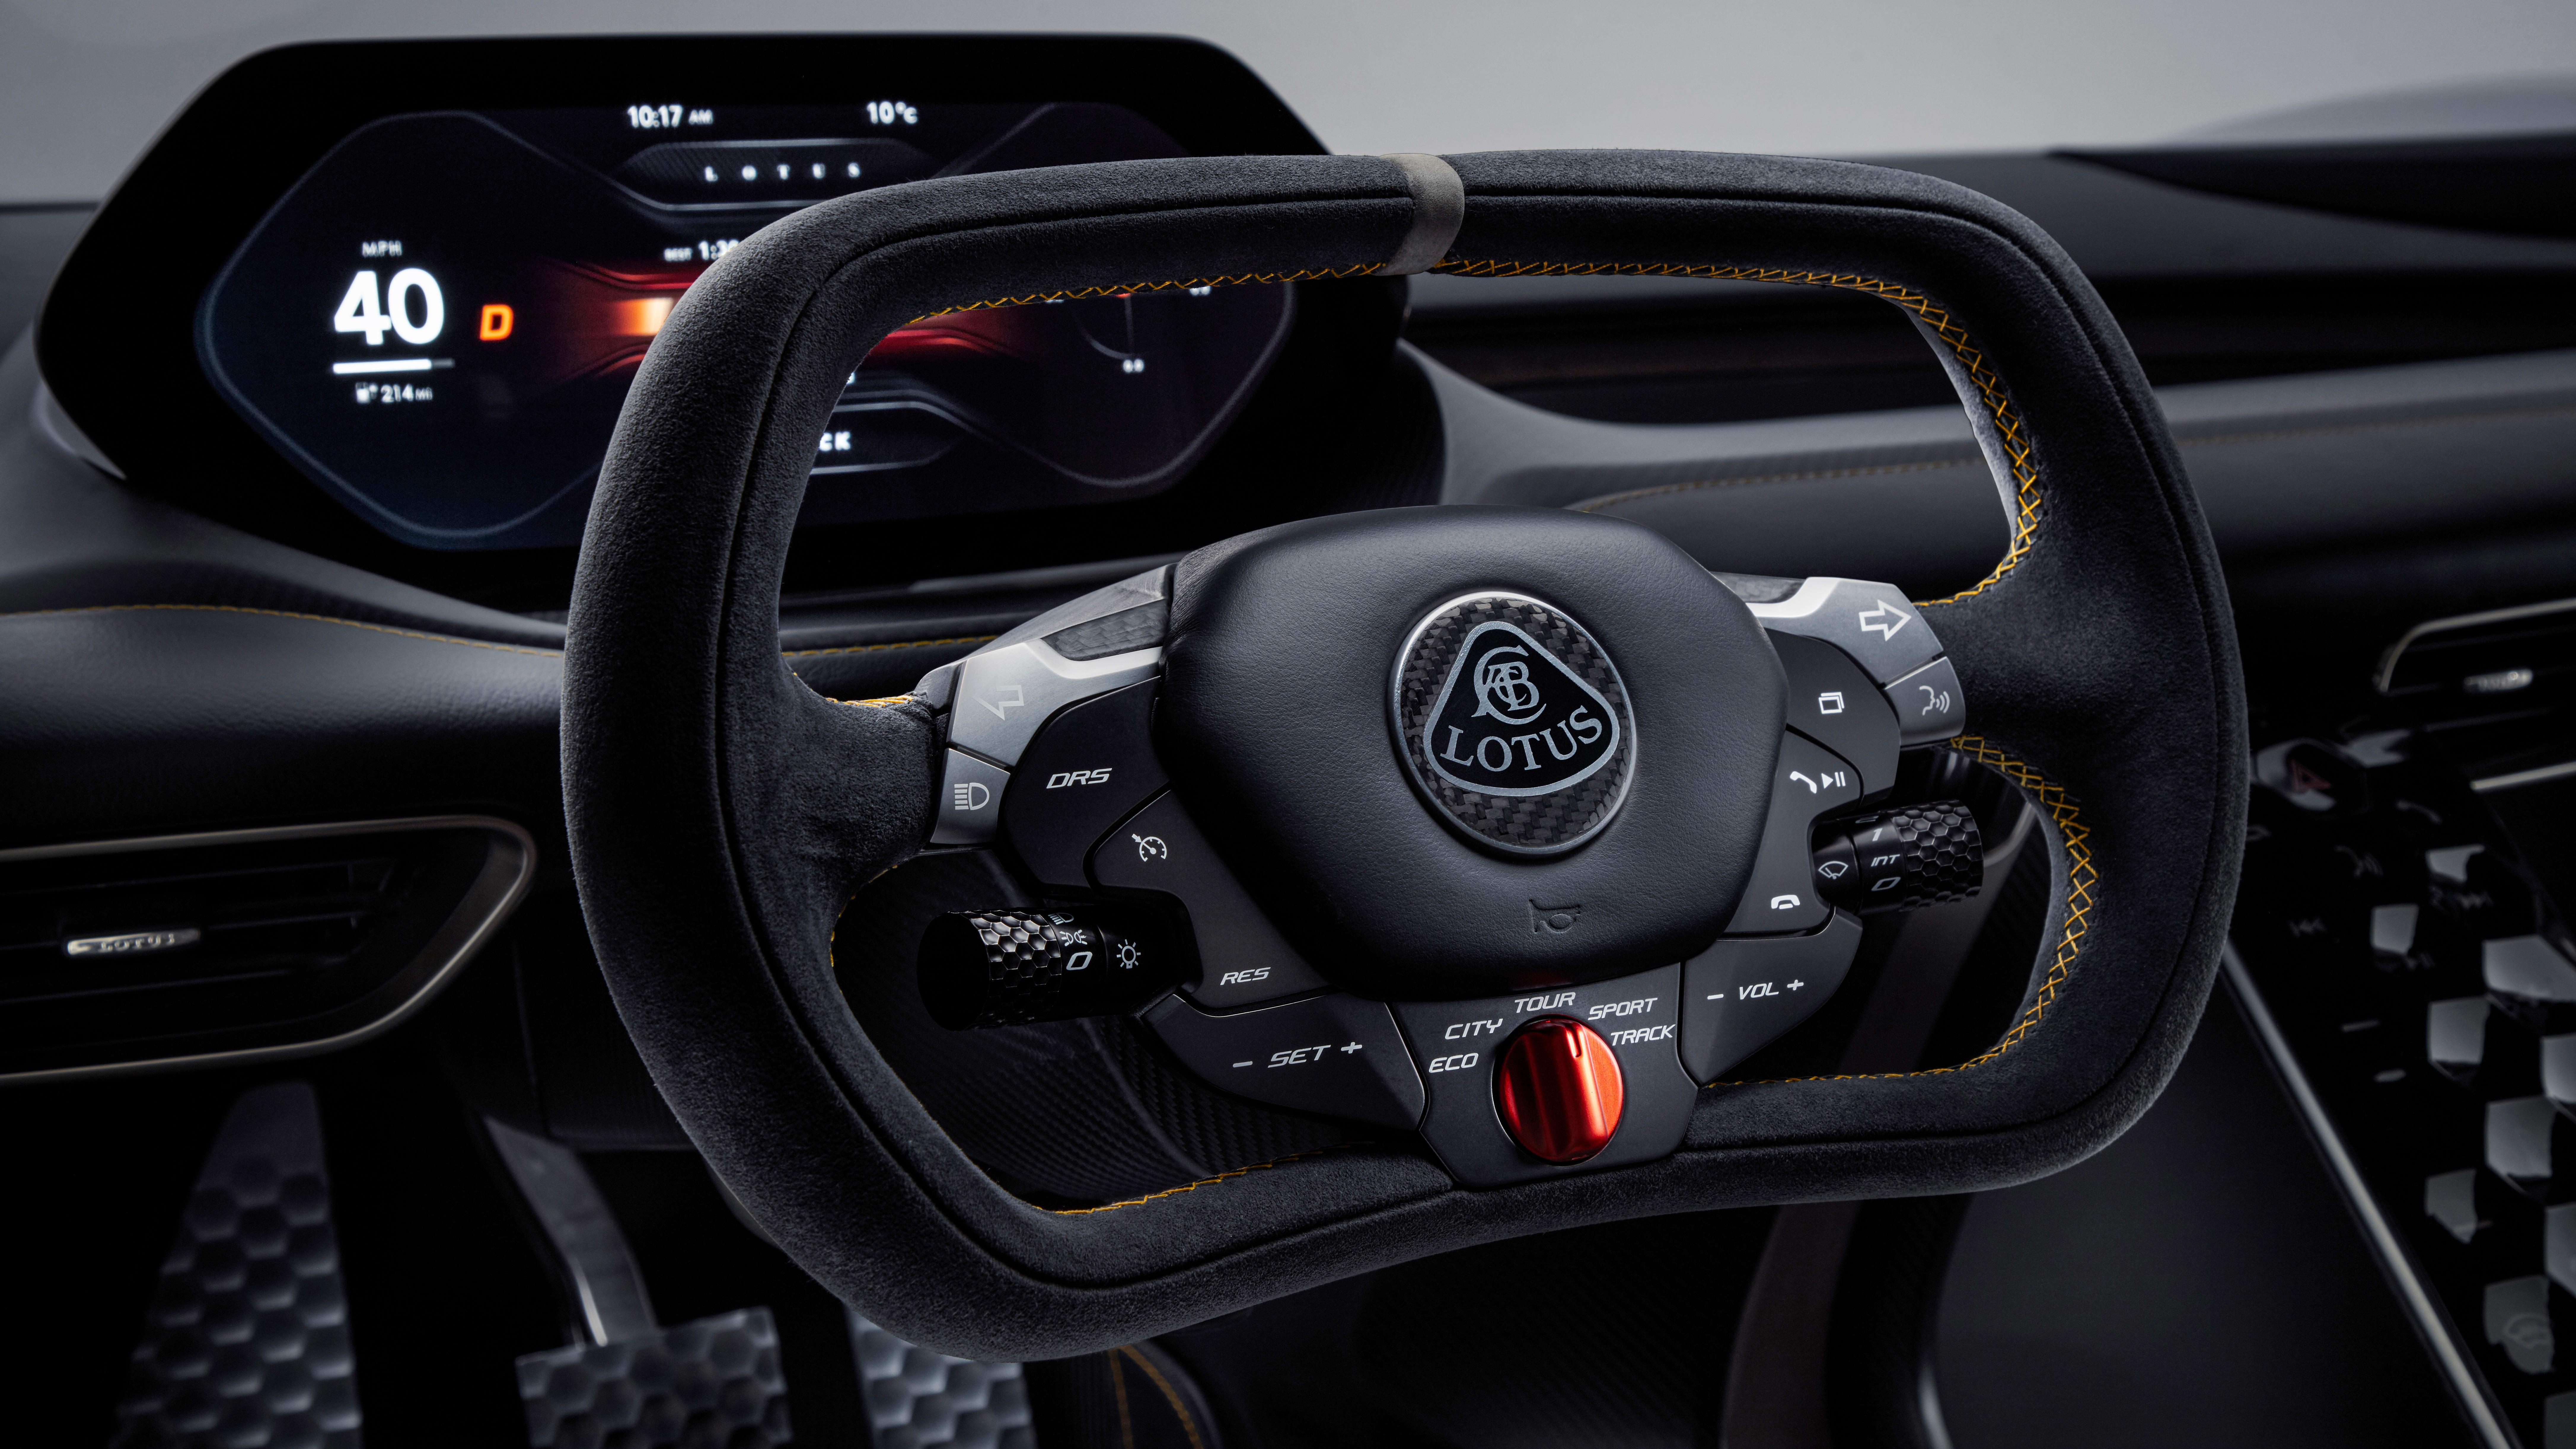 2021 The Lotus Evora Configurations